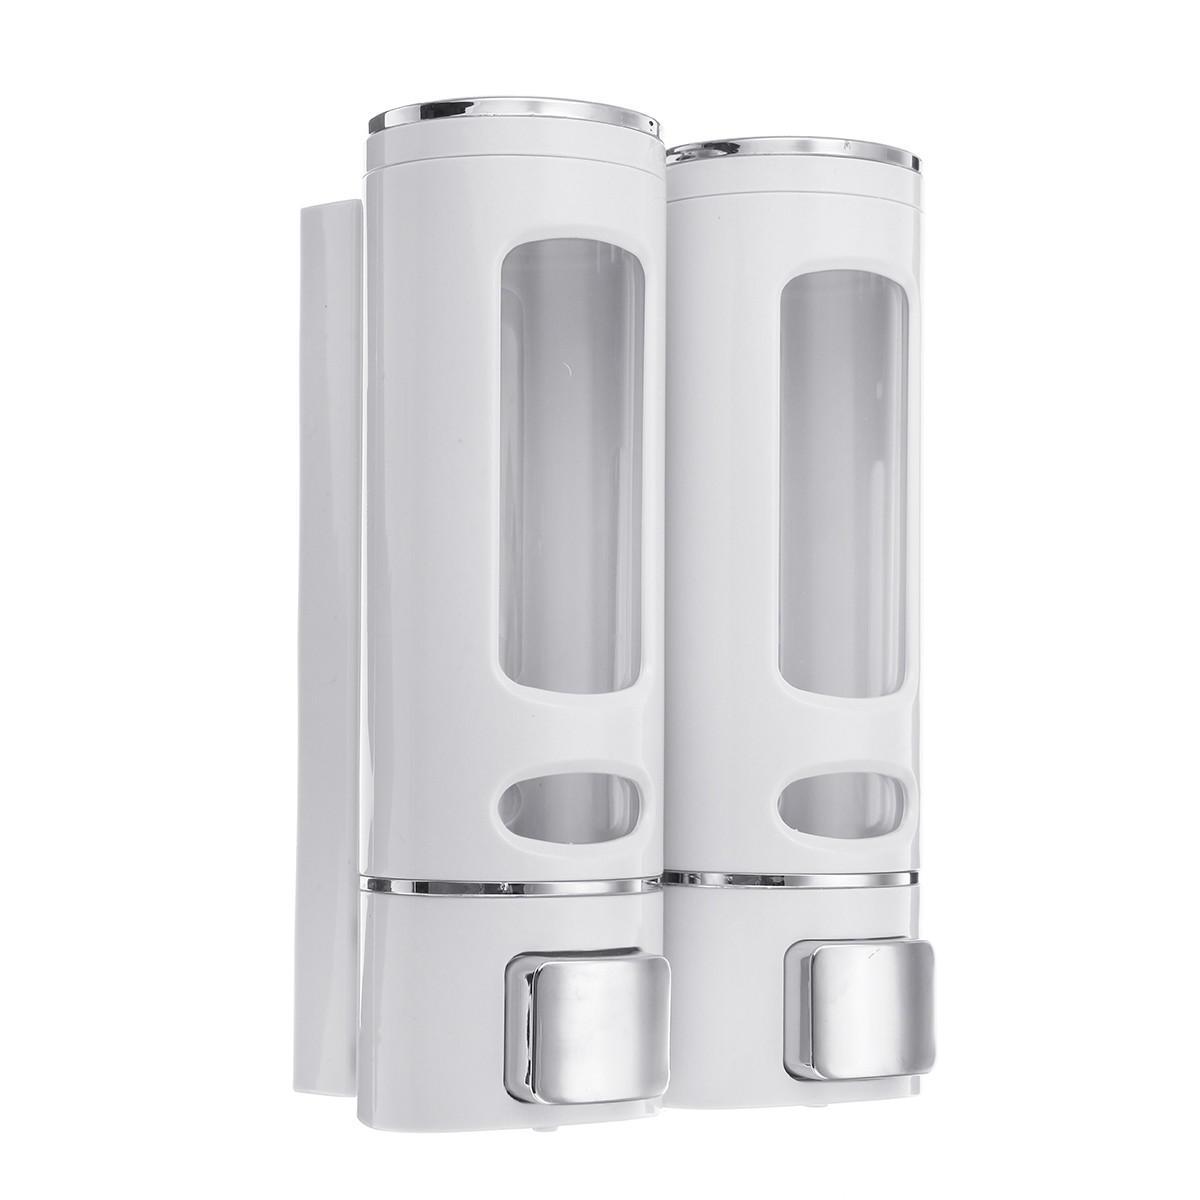 2Pcs/Set 400ML Liquid Soap Dispenser Wall Mounted Hand Sanitizer Shower Gel Shampoo